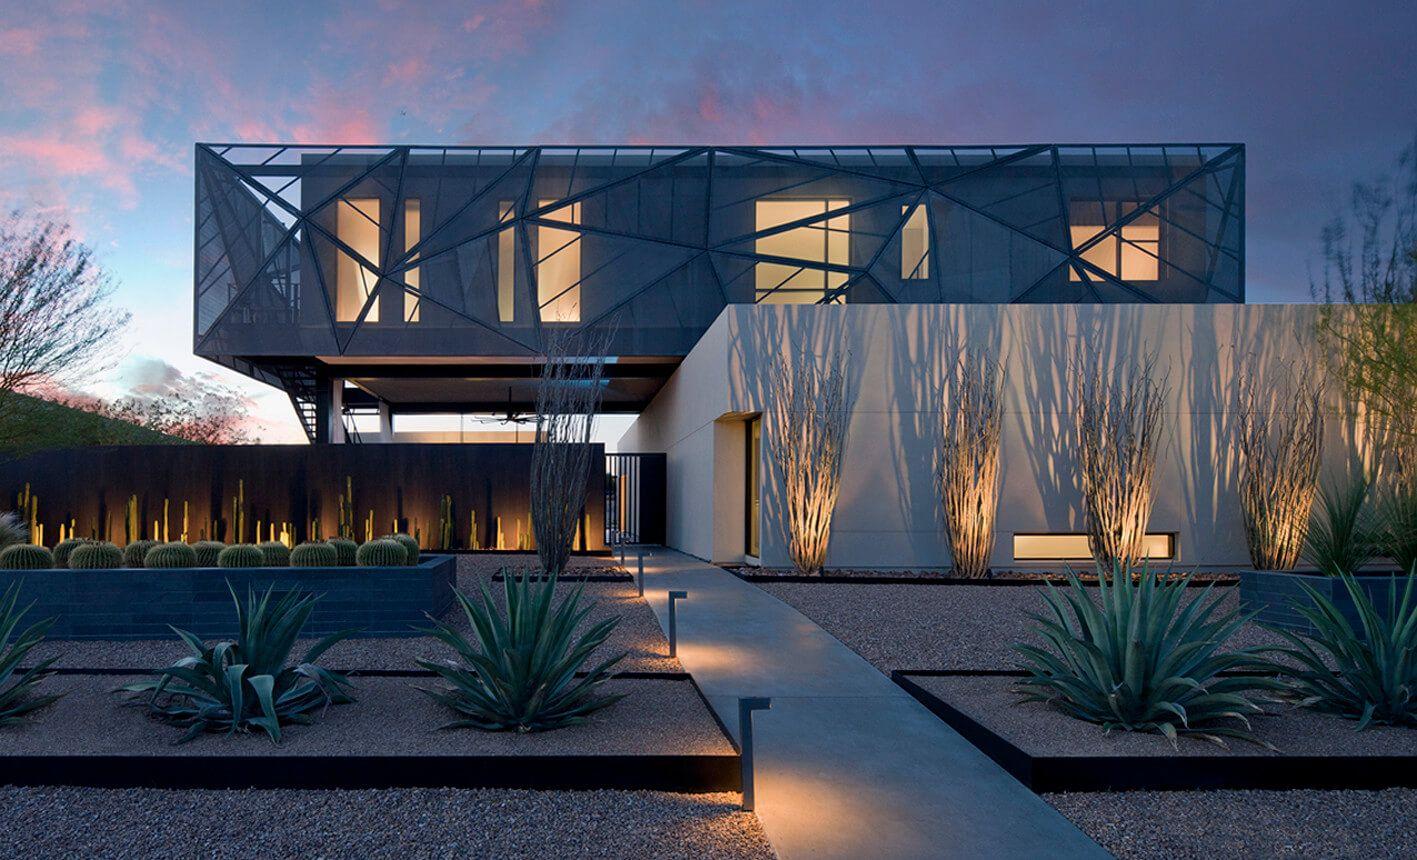 Top 5 Luxurious And Modern Villa Designs In 2020 Architecture Modern Landscape Design